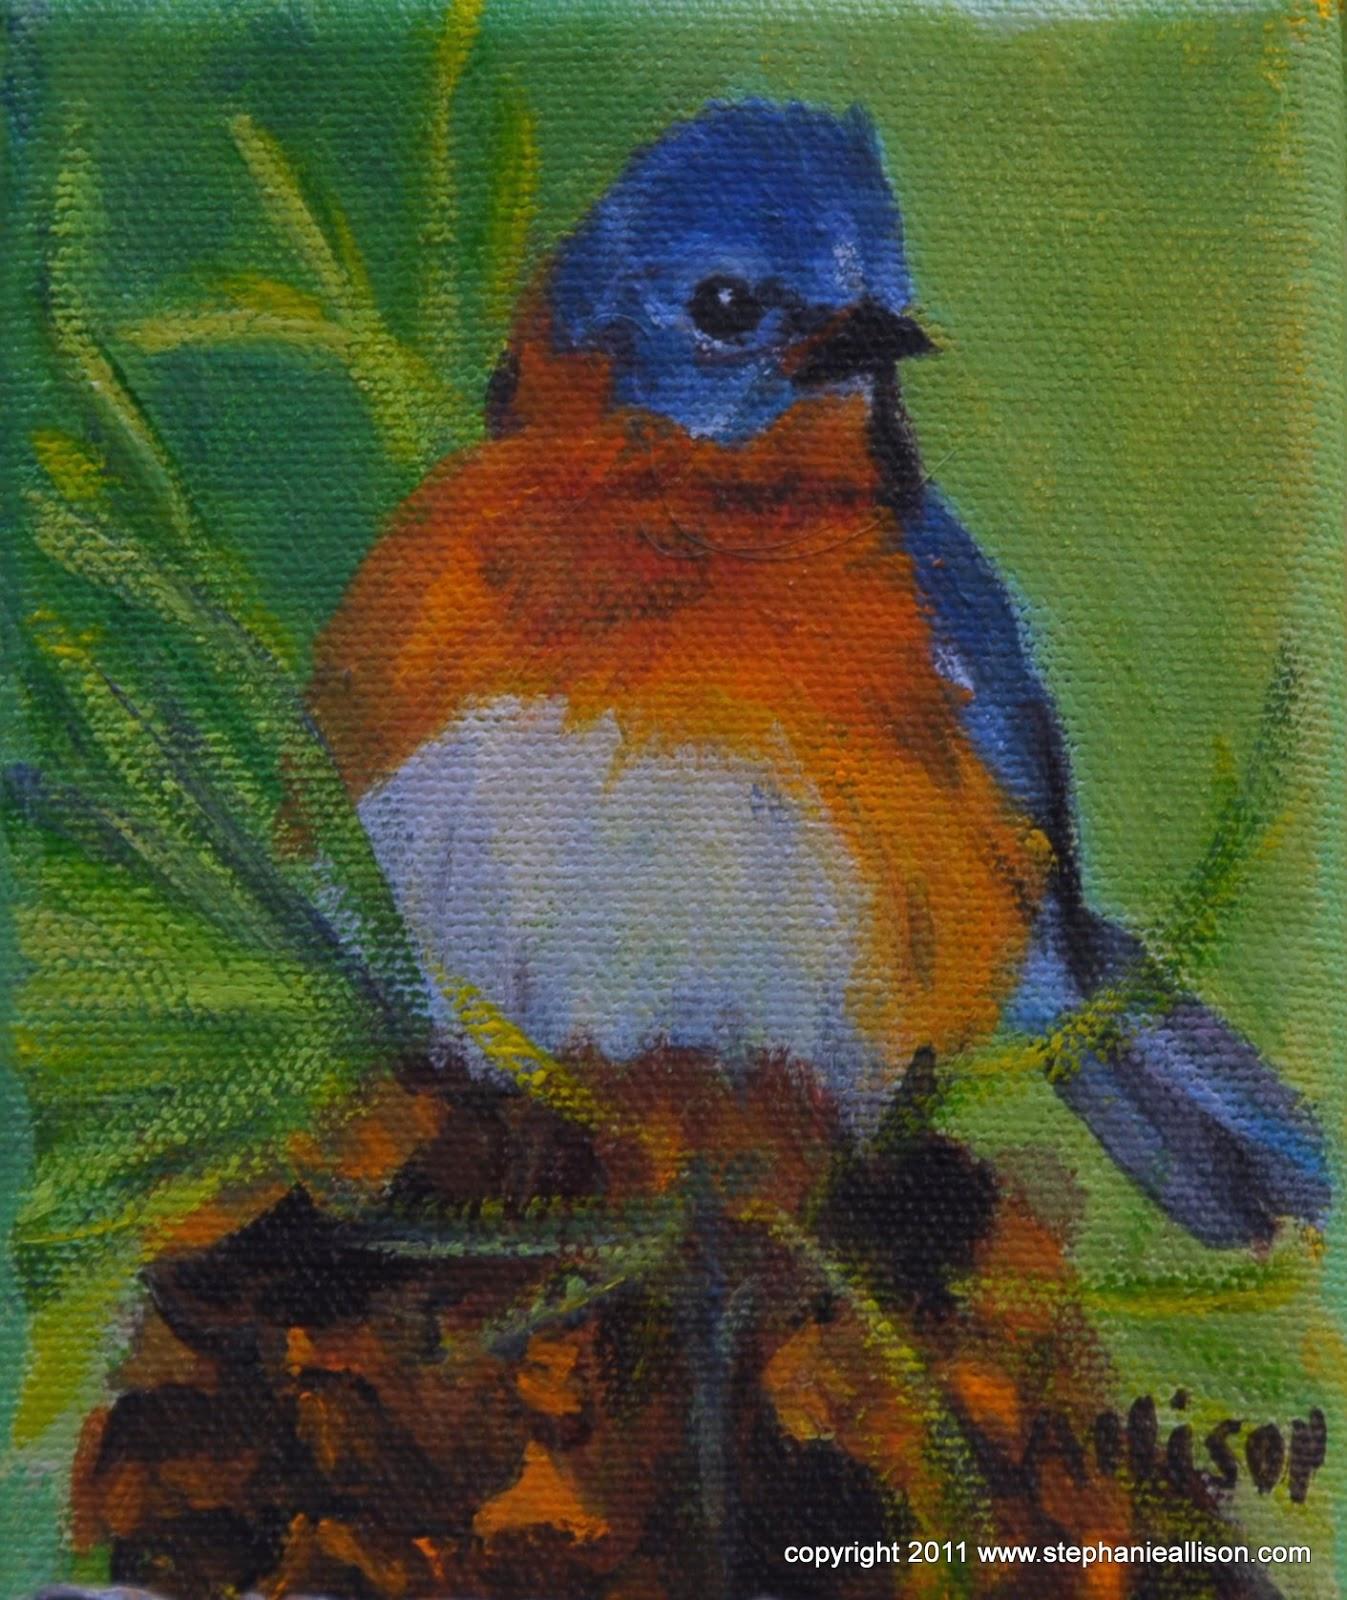 Bluebird By Kentucky Artist Stephanie Allison Daily